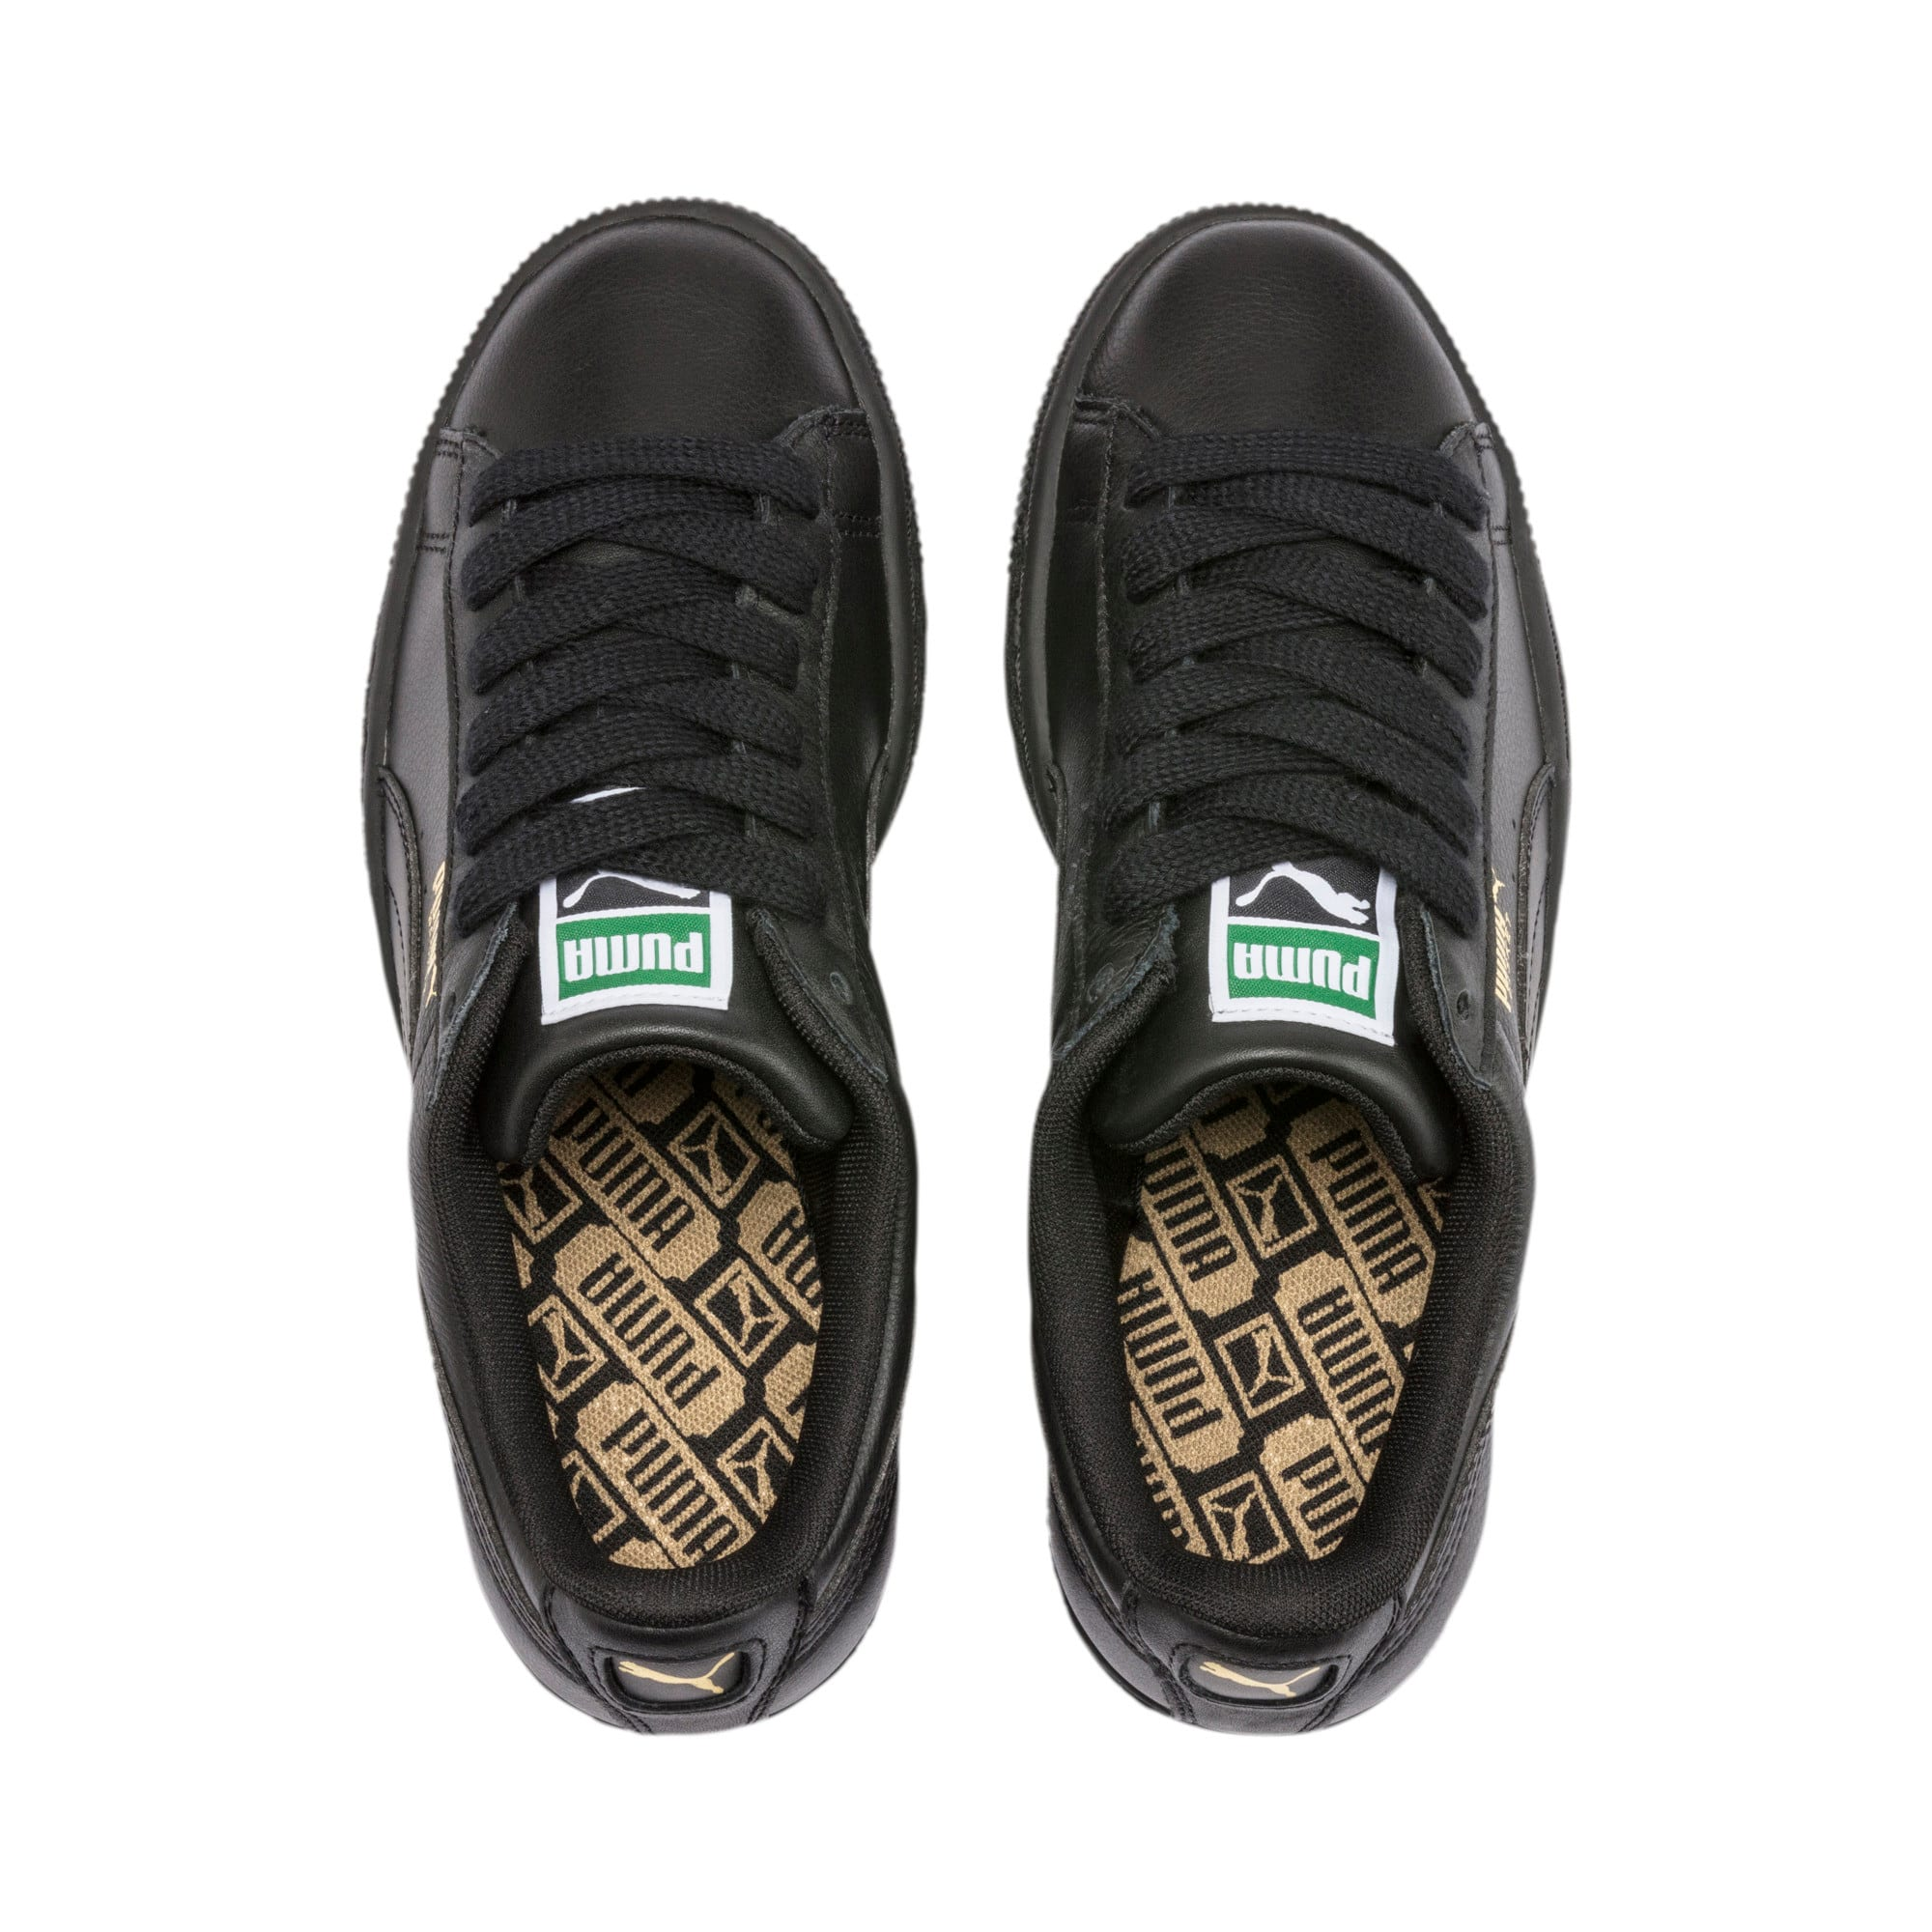 Thumbnail 6 of Basket Classic LFS Men's Shoes, black-team gold, medium